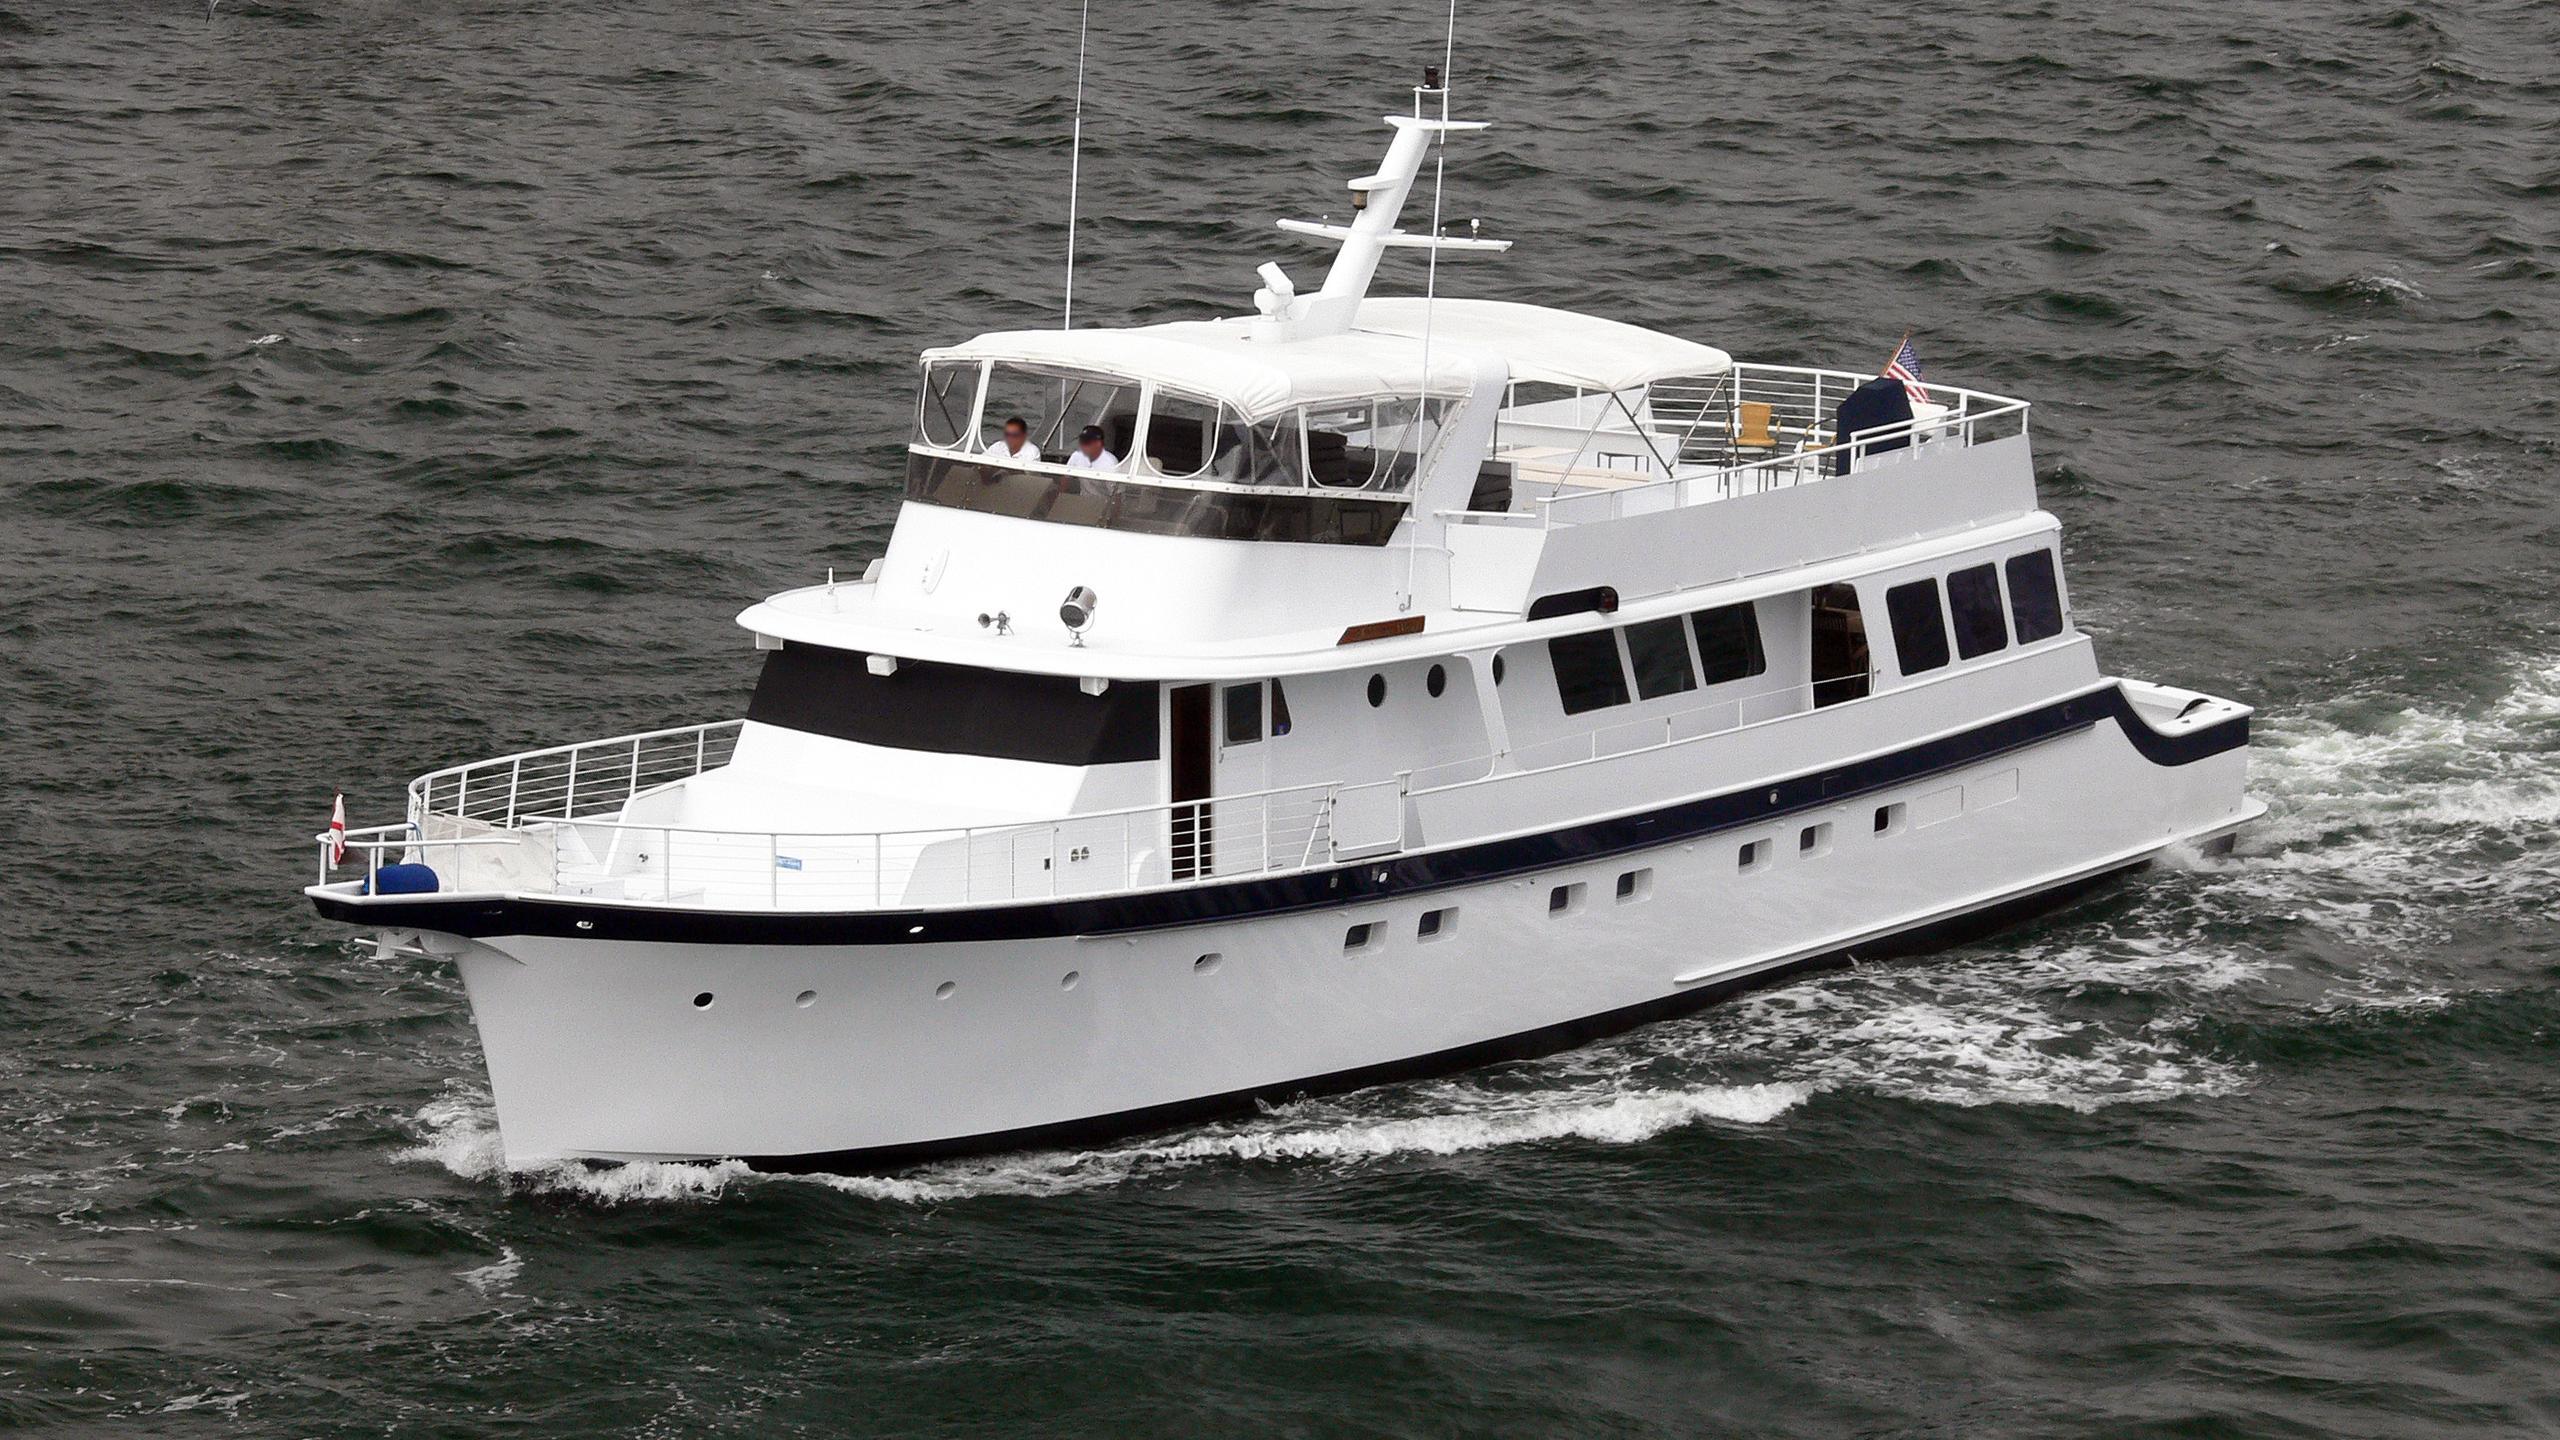 the-summer-wind-motor-yacht-kerstholt-1966-28m-cruising